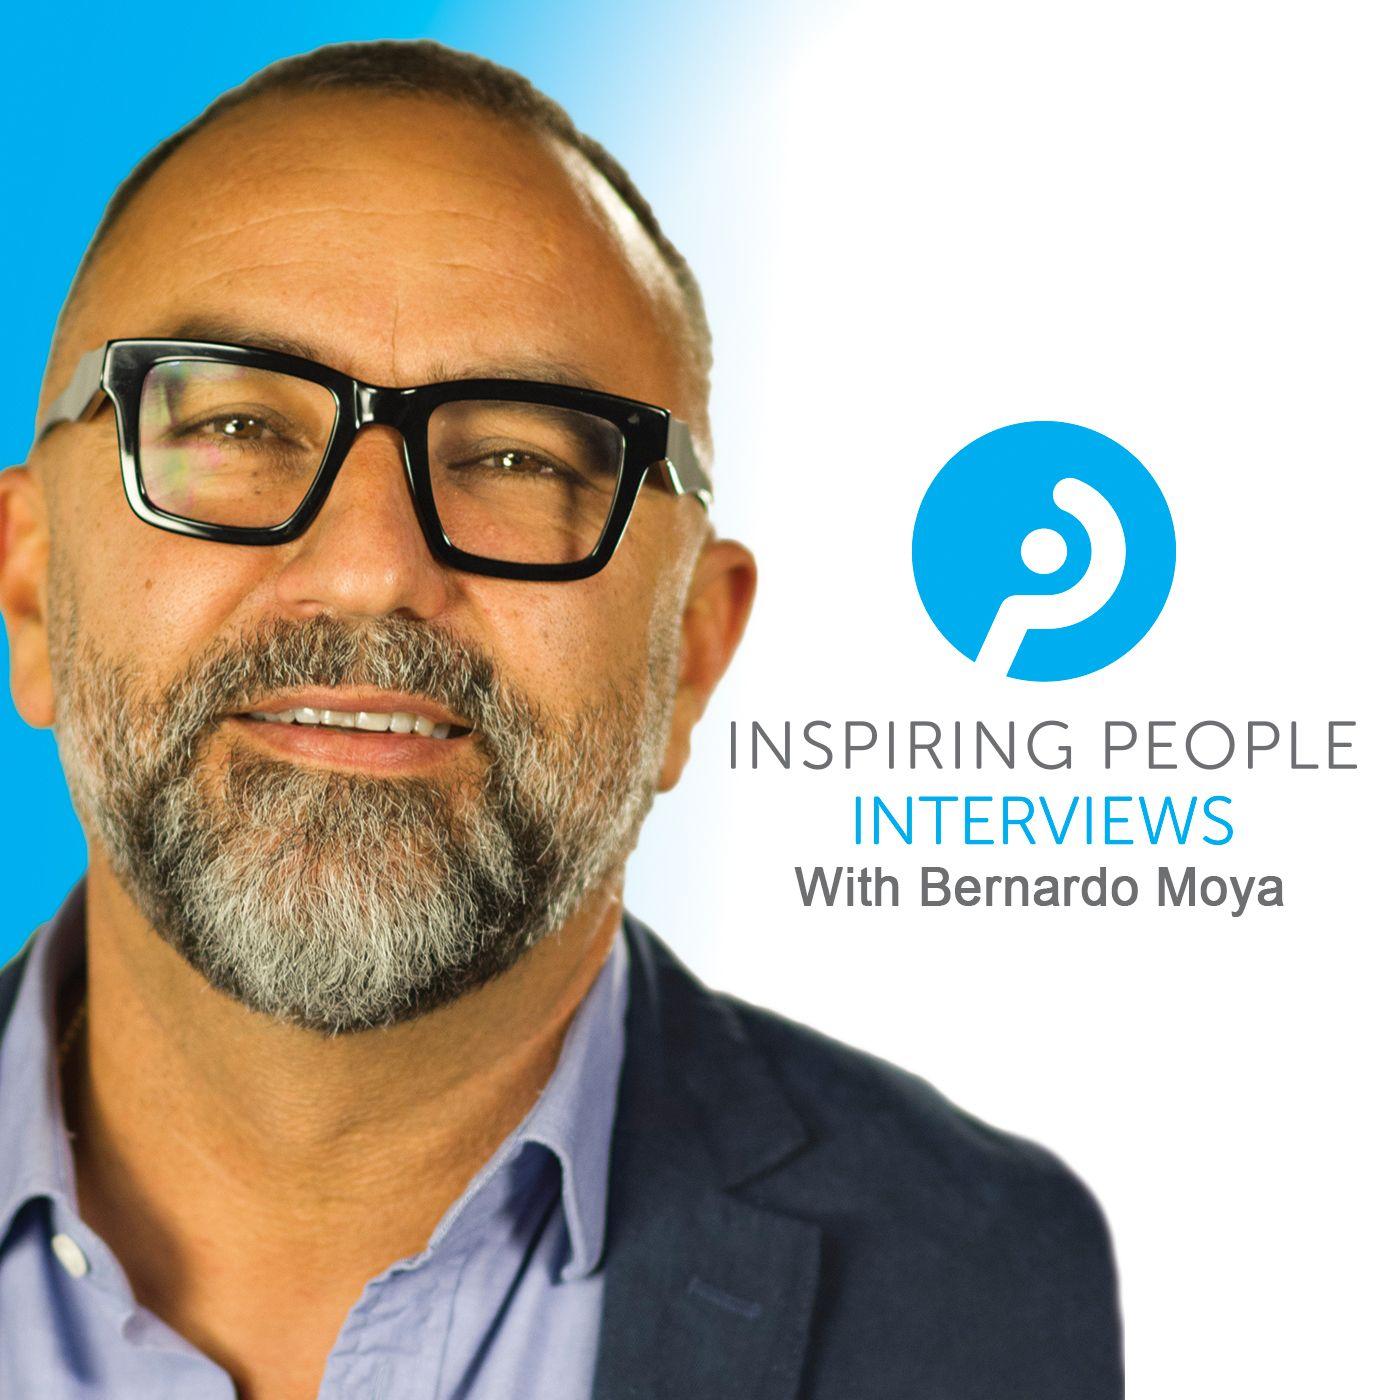 Bernardo Moya's Inspiring People